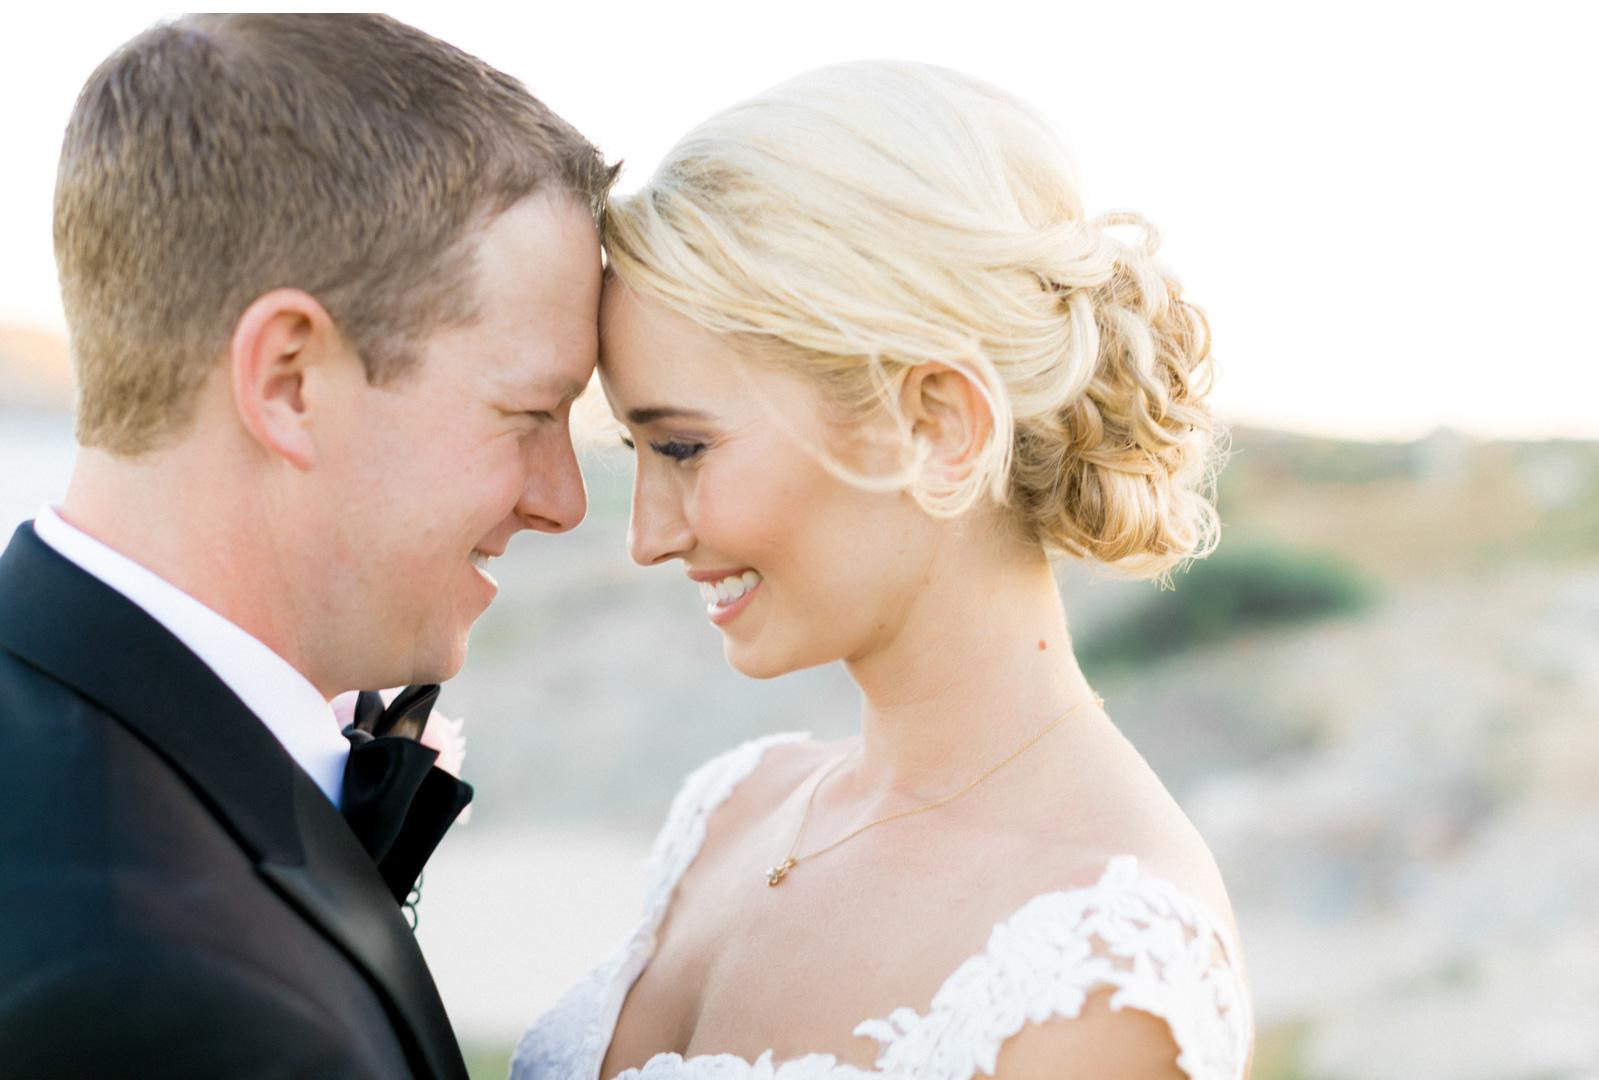 Hawaii-Destination-Wedding-Natalie-Schutt-Photography-Style-Me-Pretty_12.jpg